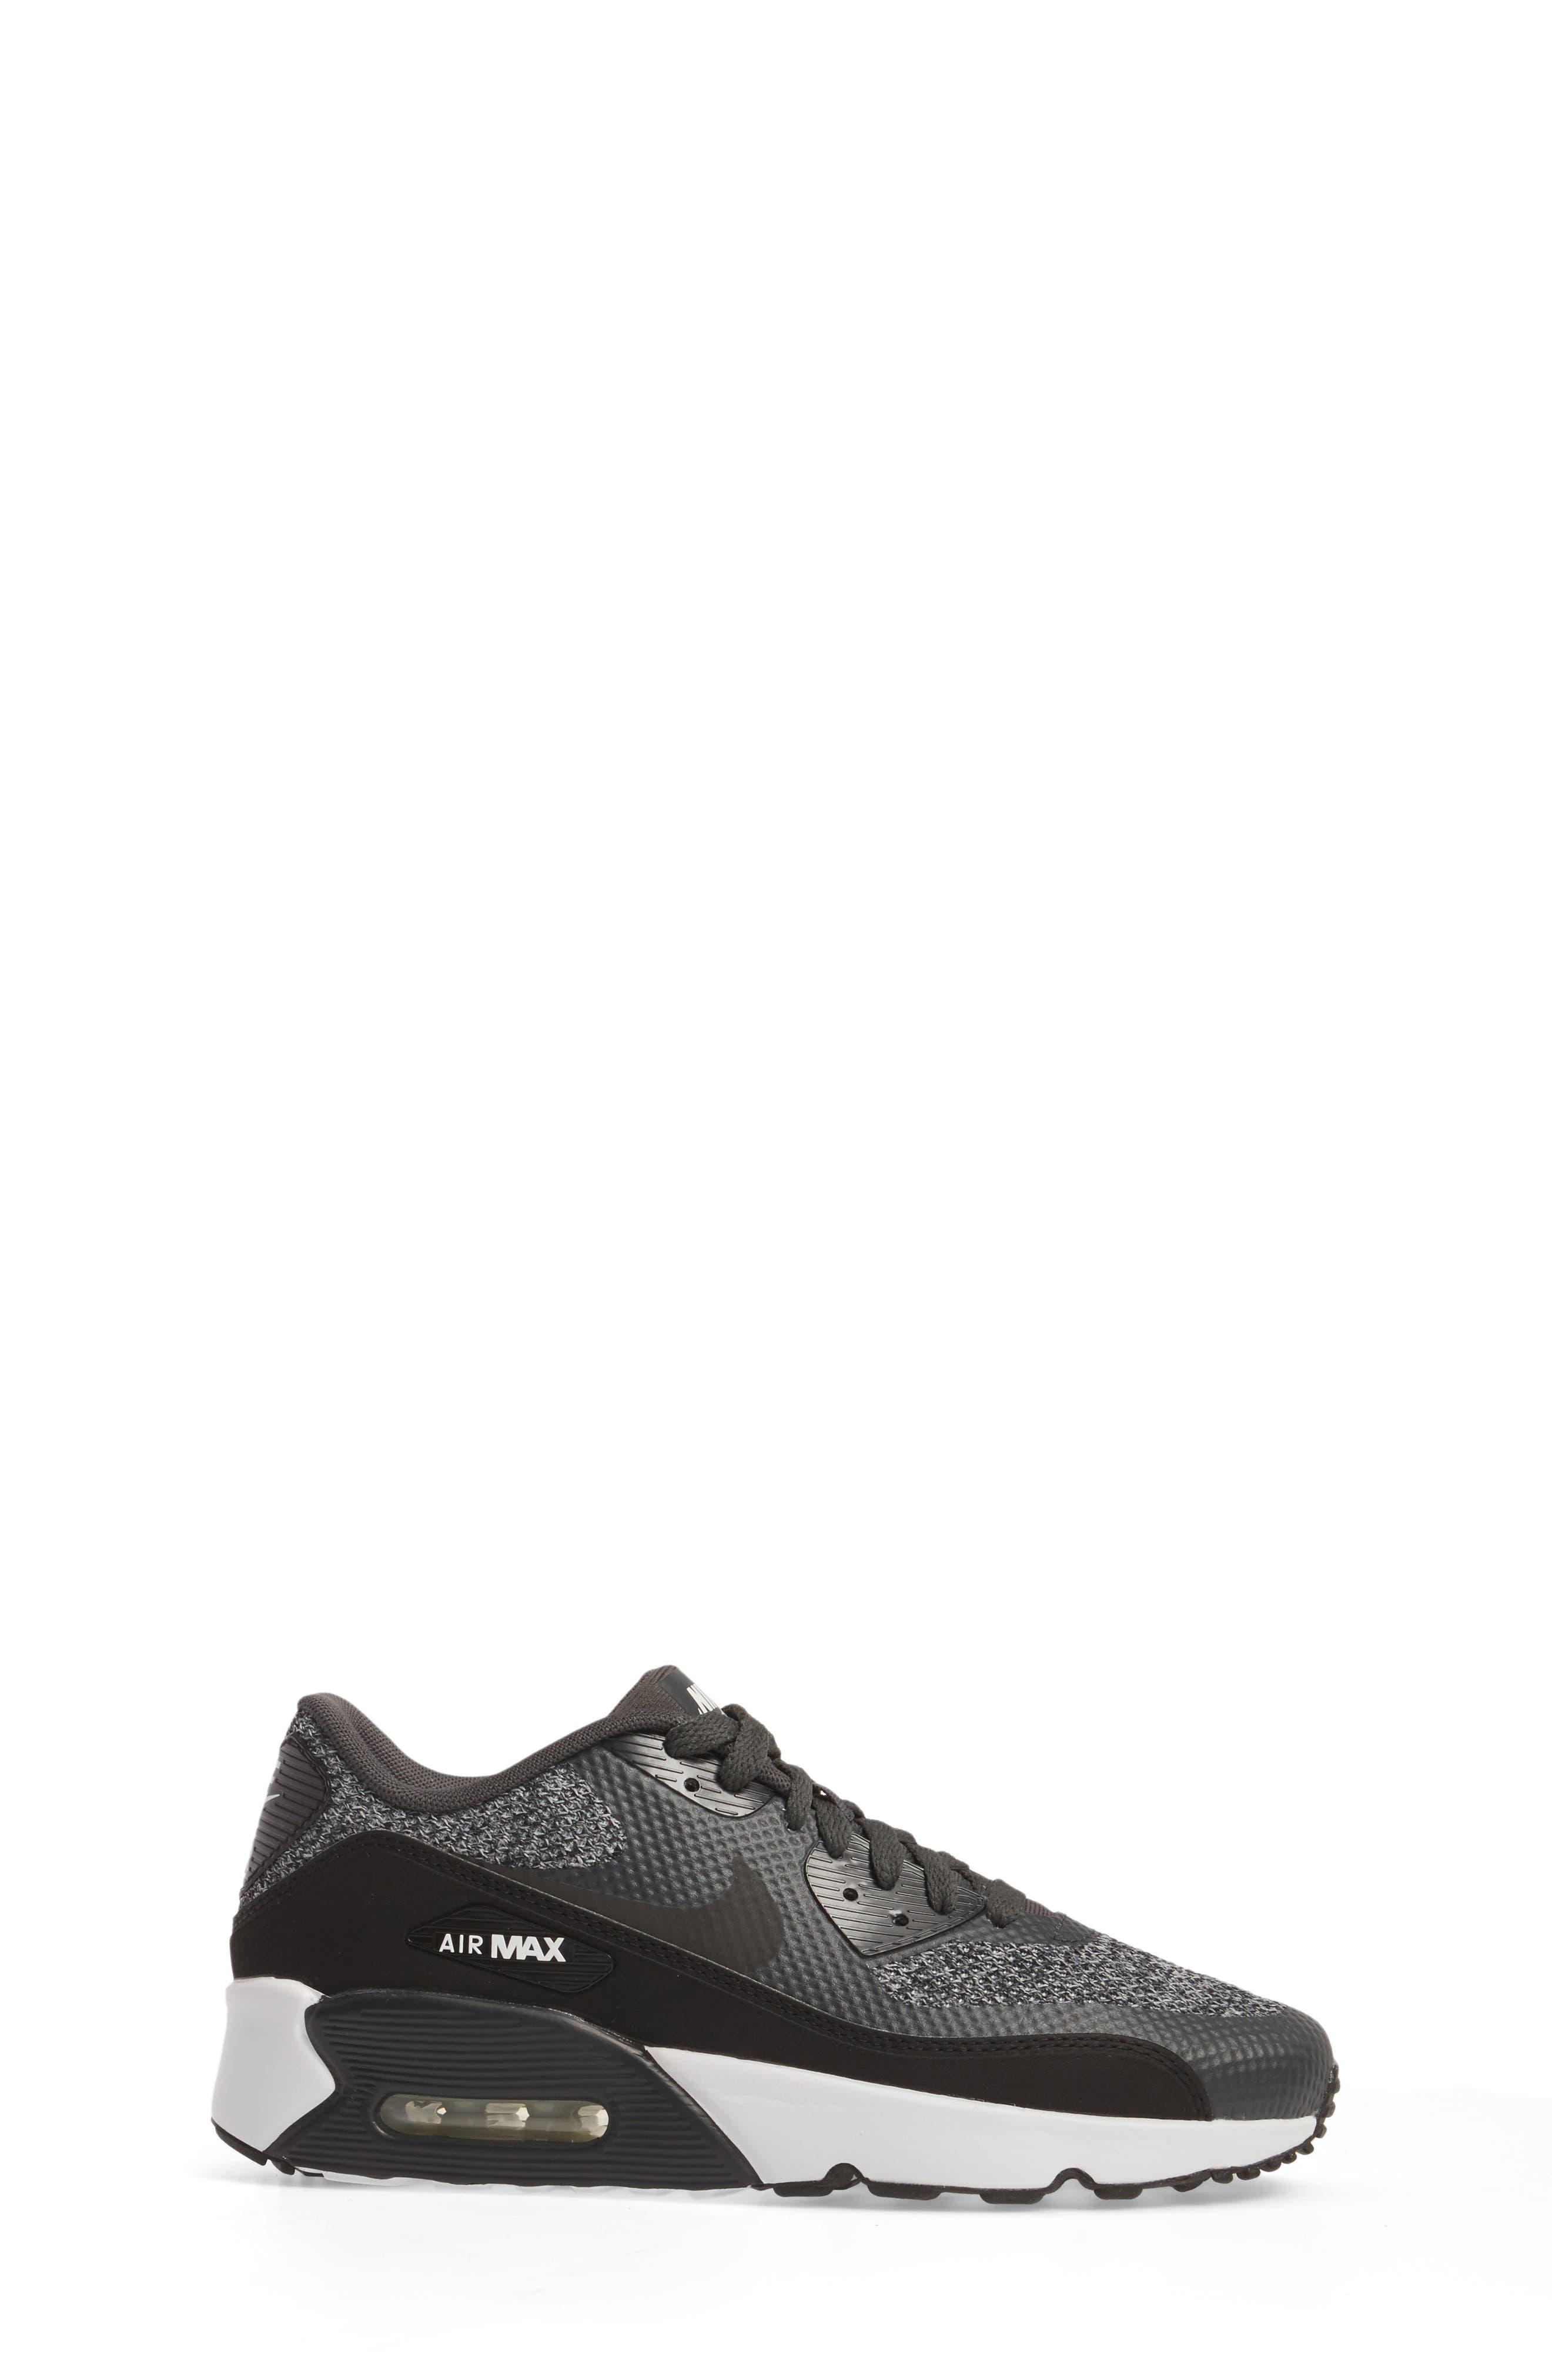 Air Max 90 Ultra 2.0 SE Sneaker,                             Alternate thumbnail 3, color,                             Anthracite/ Black